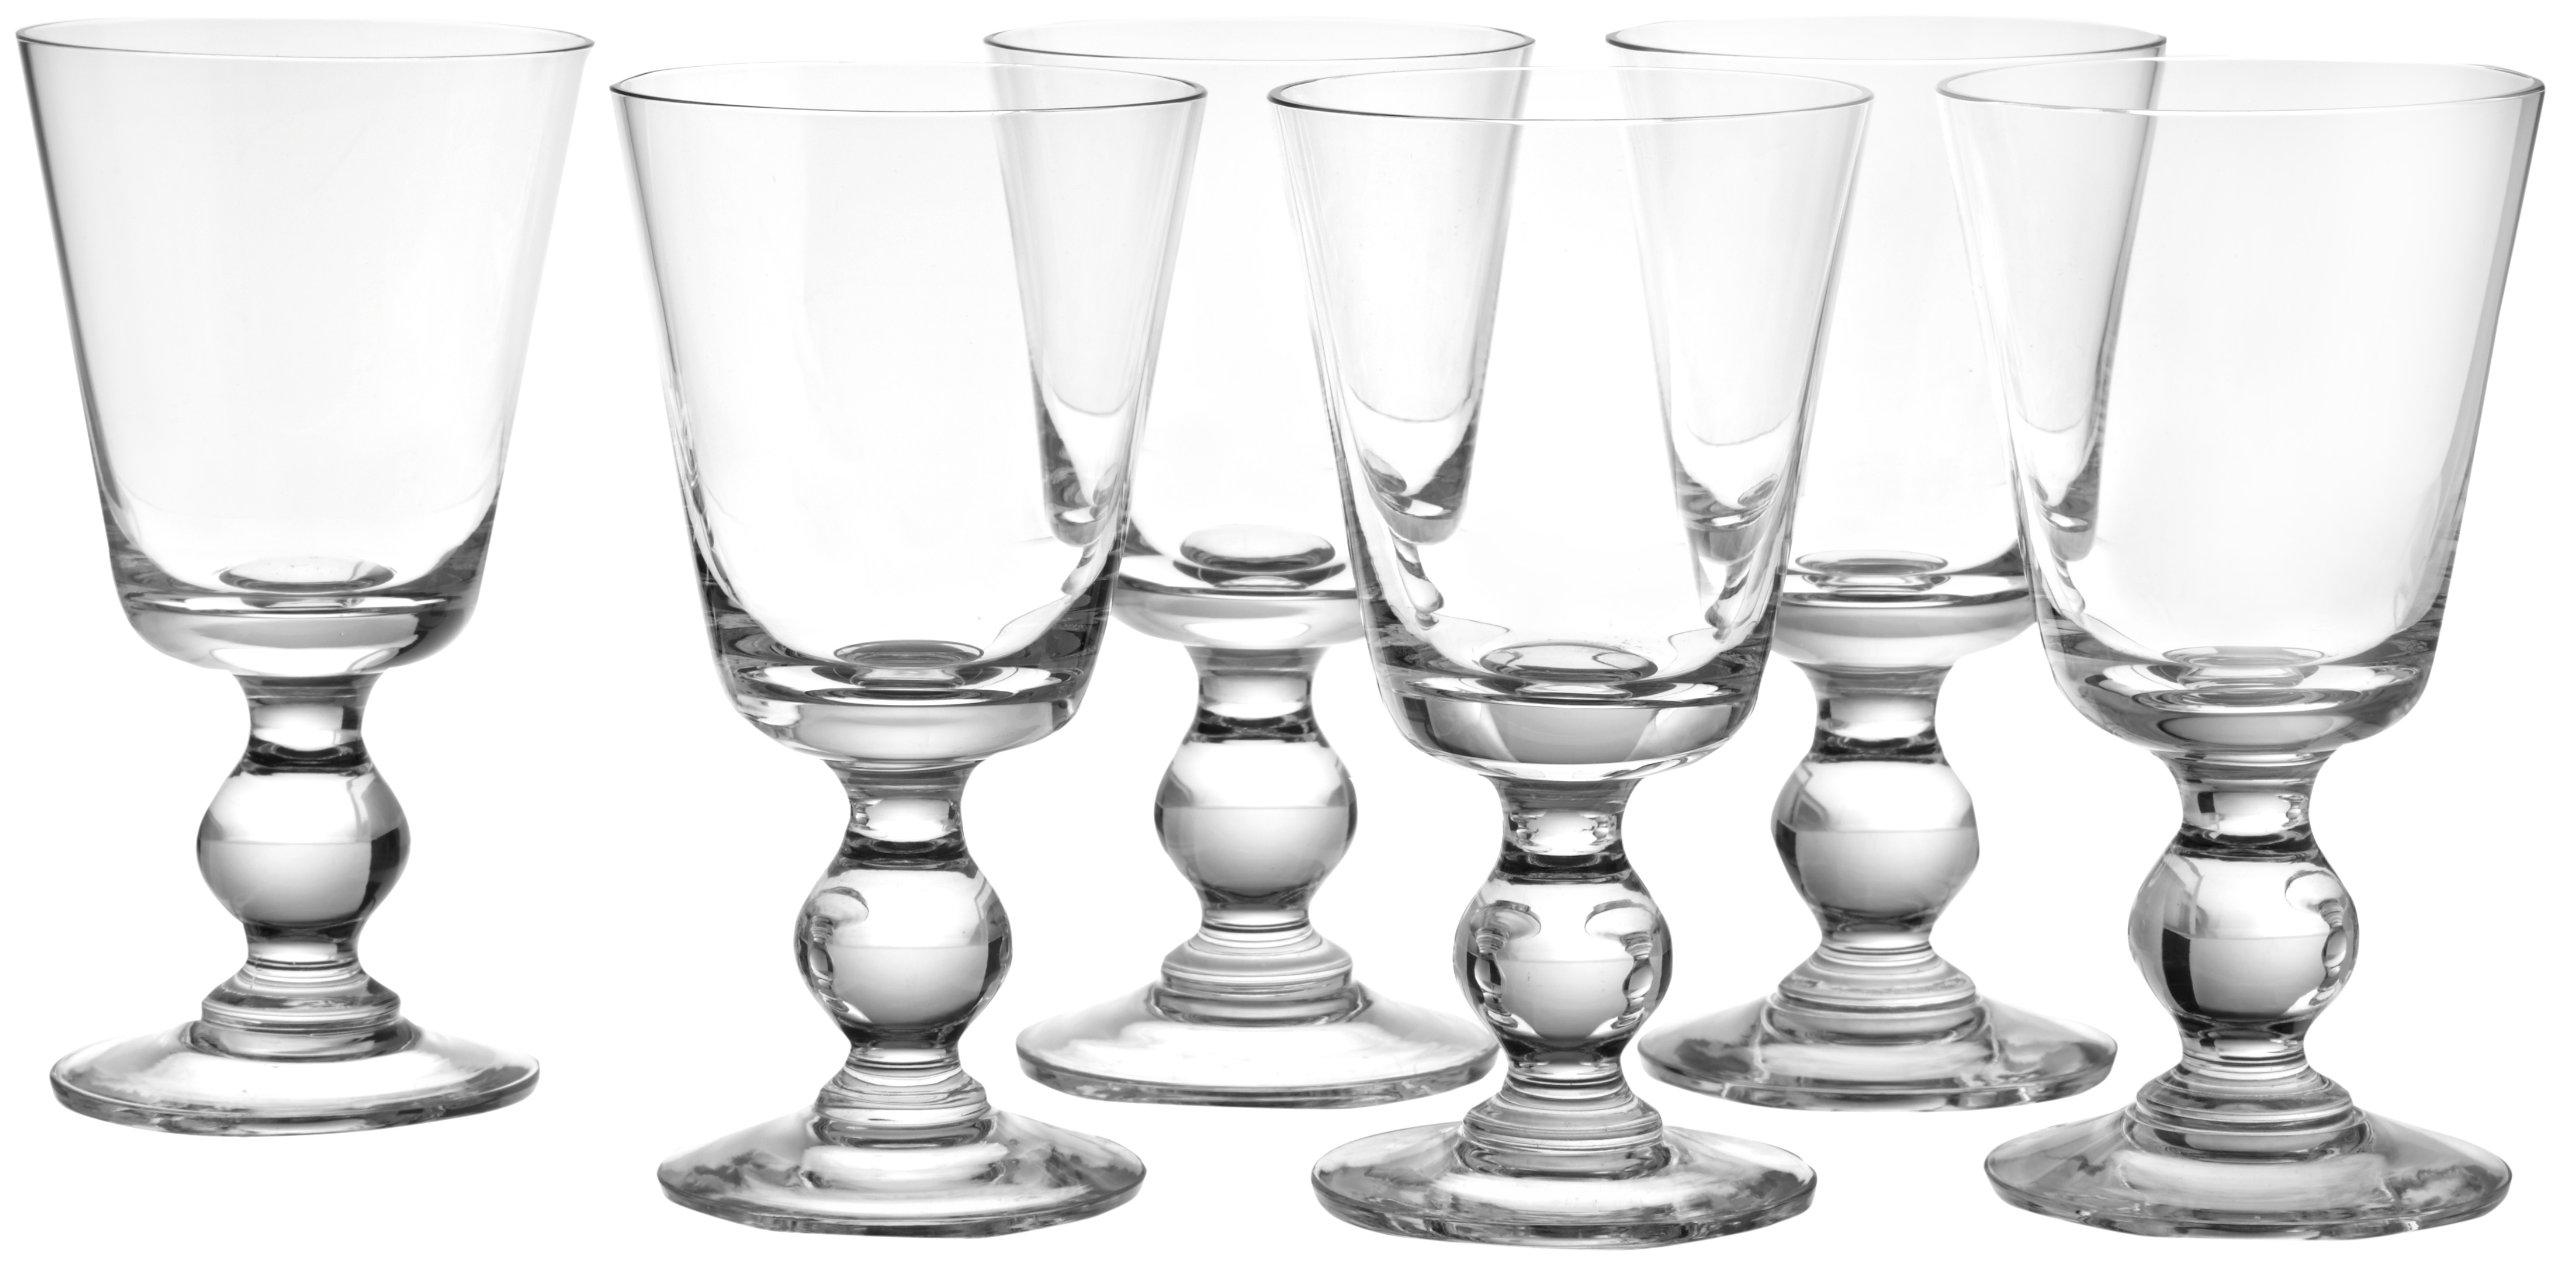 La Rochere Set Of 6, 8.5-ounce Bocage Mouth Blown Wine Glasses by La Rochere (Image #2)